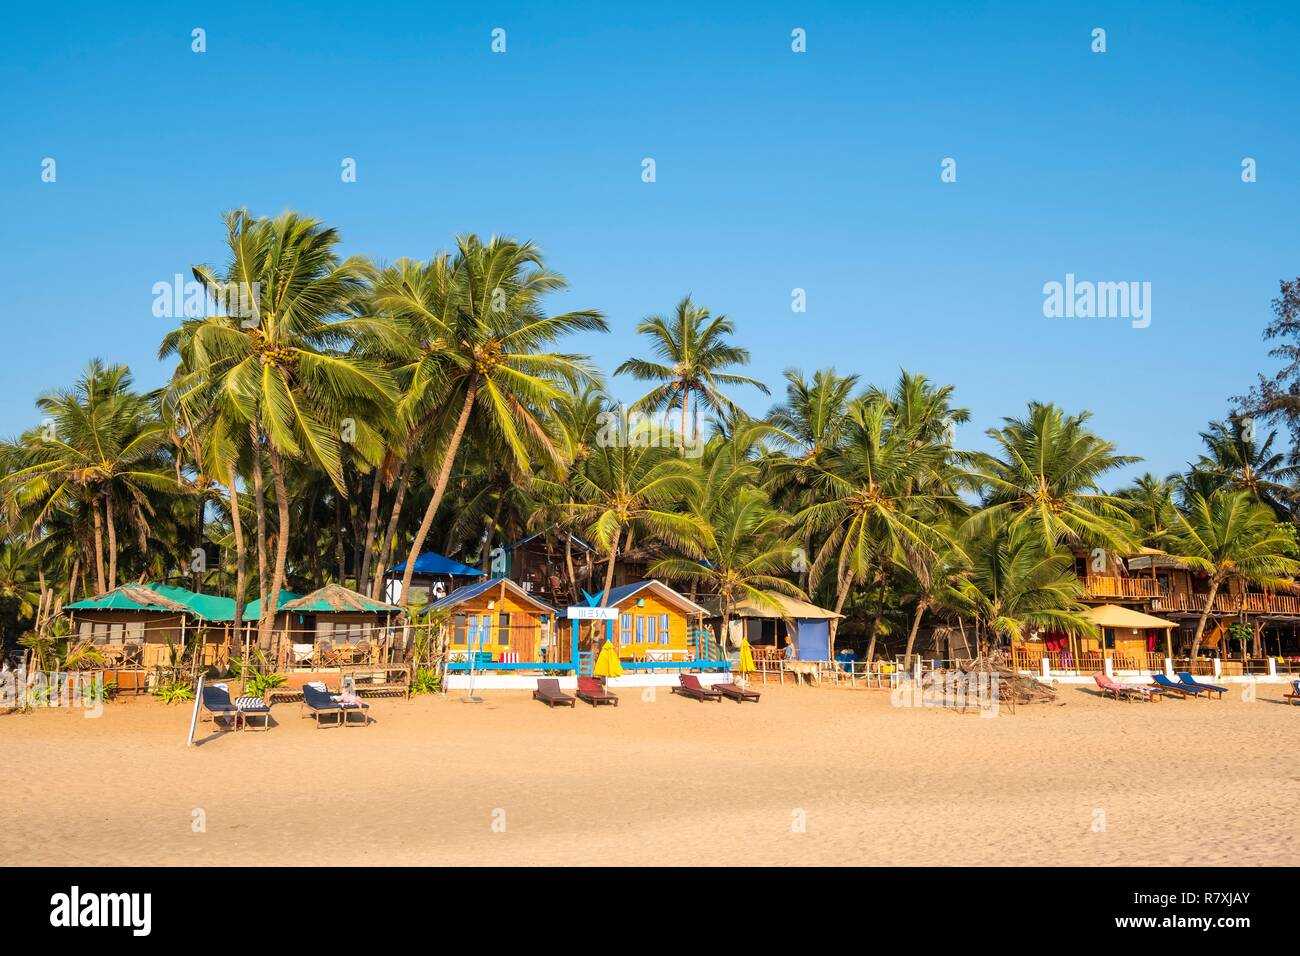 India goa agonda beach bungalows along the beach